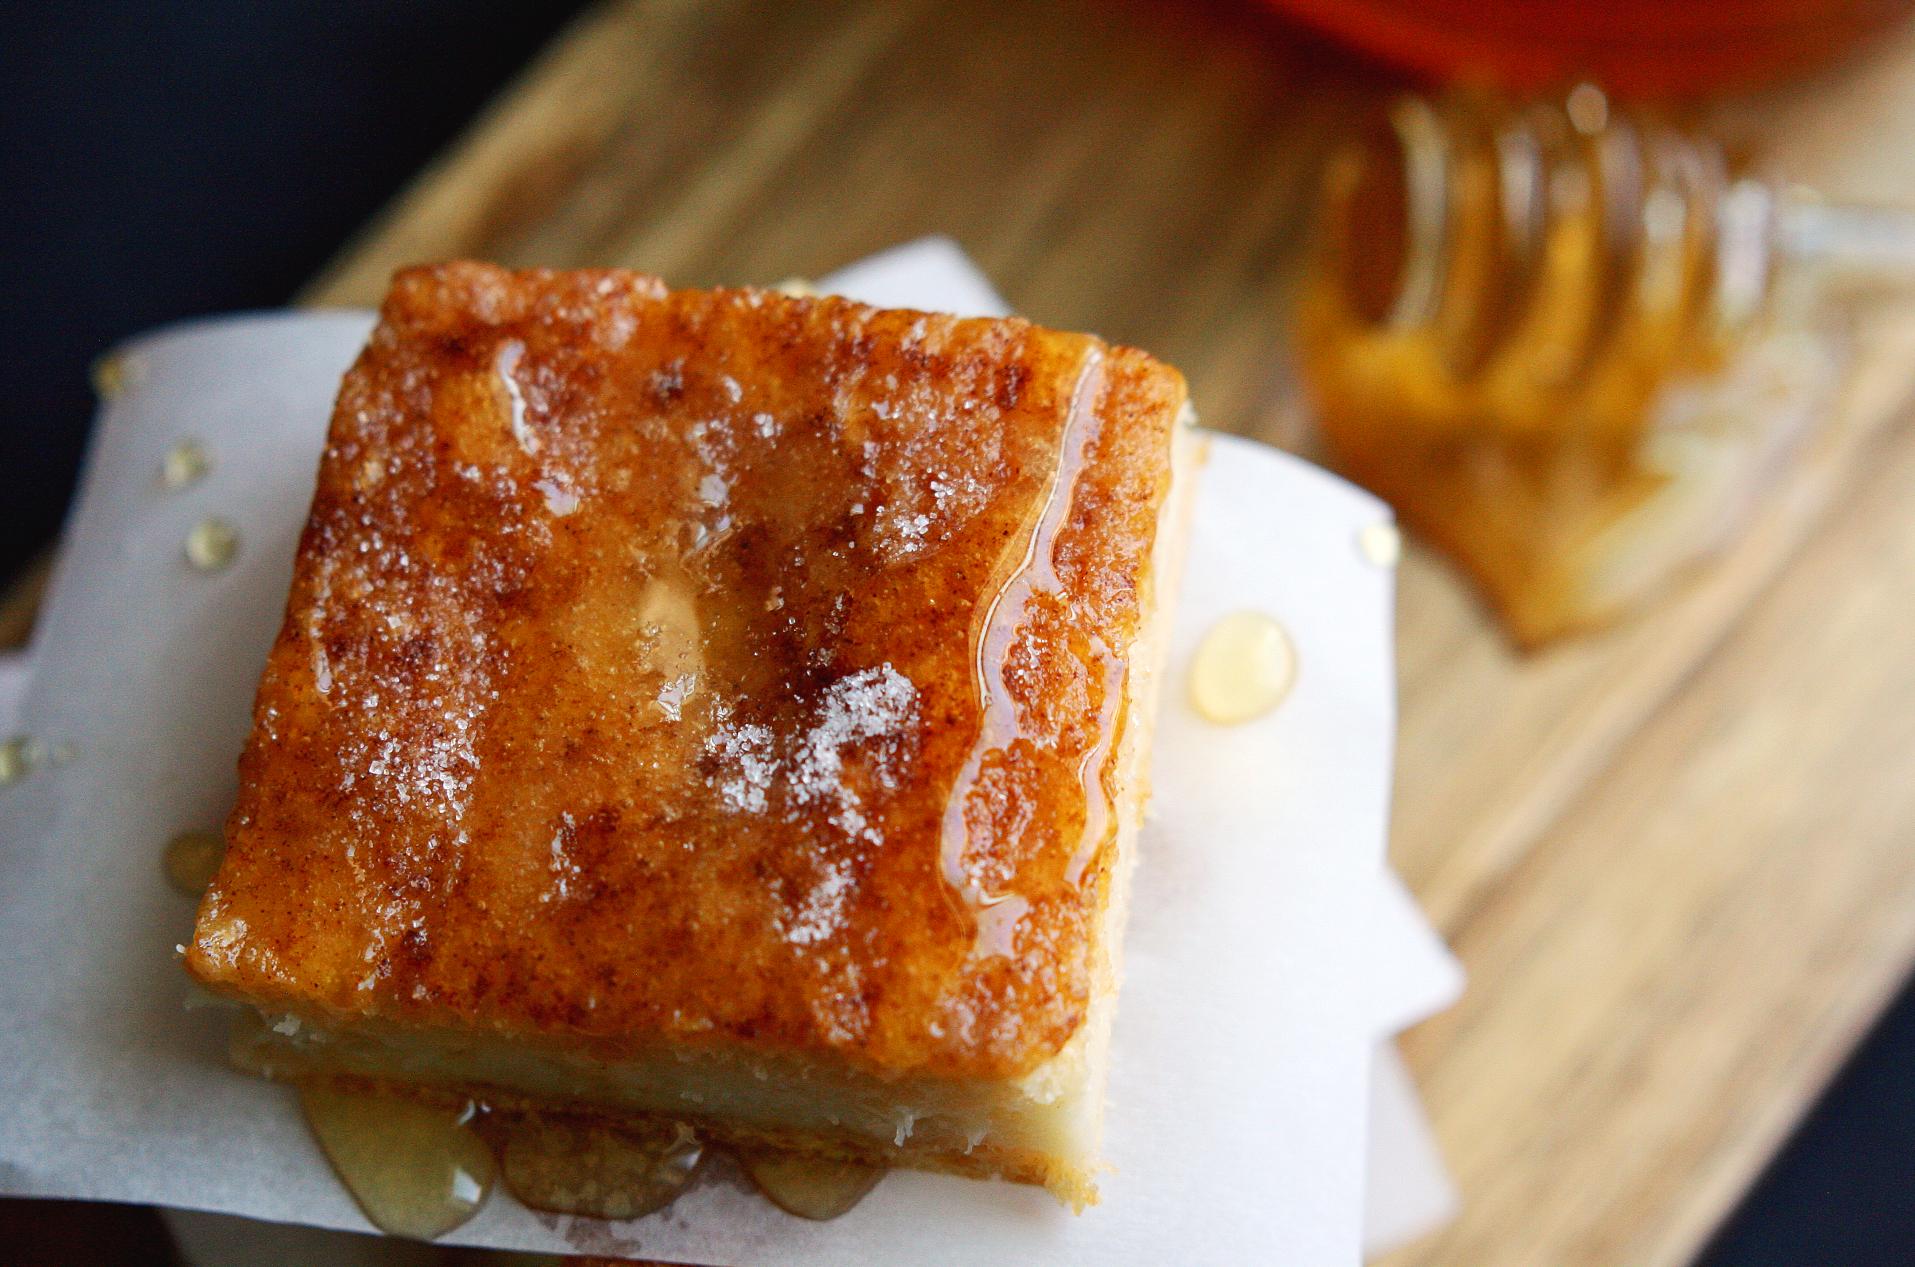 Churro Cheesecake Bars #churrocheesecake Churro Cheesecake bars are flaky pastry layers baked with a vanilla cheesecake filling and sprinkled with cinnamon sugar. #churrocheesecake Churro Cheesecake Bars #churrocheesecake Churro Cheesecake bars are flaky pastry layers baked with a vanilla cheesecake filling and sprinkled with cinnamon sugar. #churrocheesecakebars Churro Cheesecake Bars #churrocheesecake Churro Cheesecake bars are flaky pastry layers baked with a vanilla cheesecake filling and sp #churrocheesecake